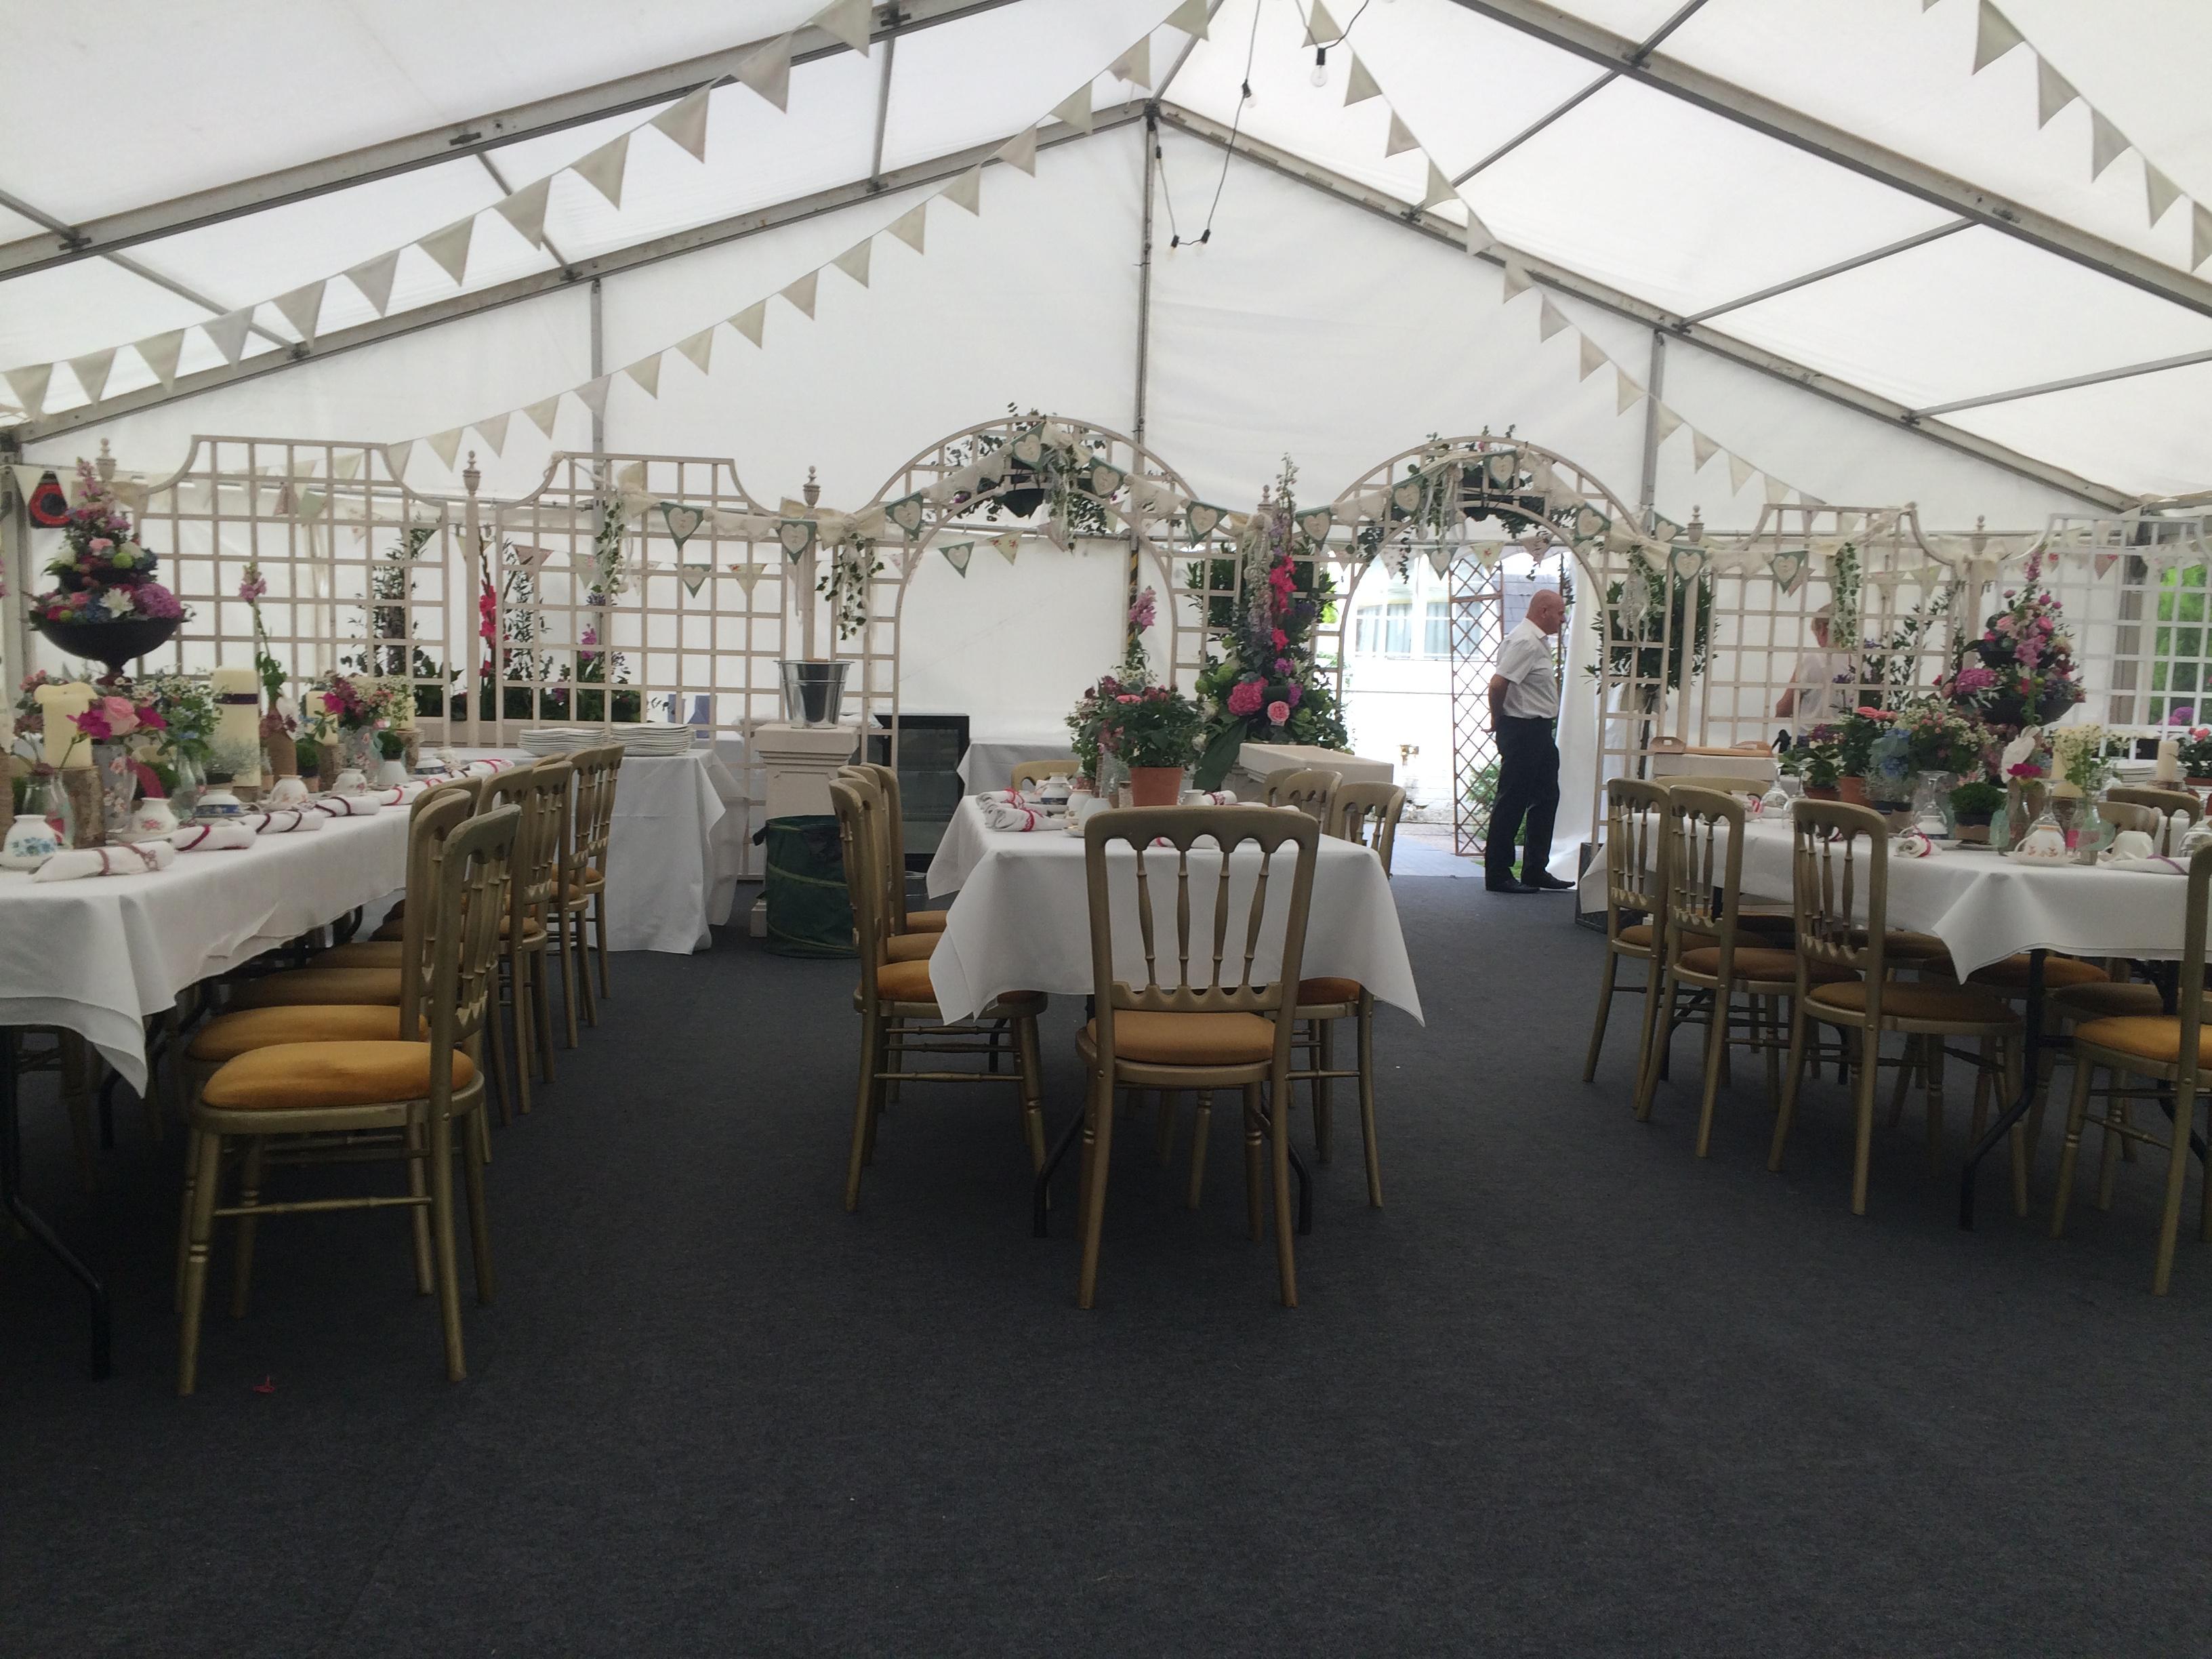 marquee-wedding-with-no-interior-lining